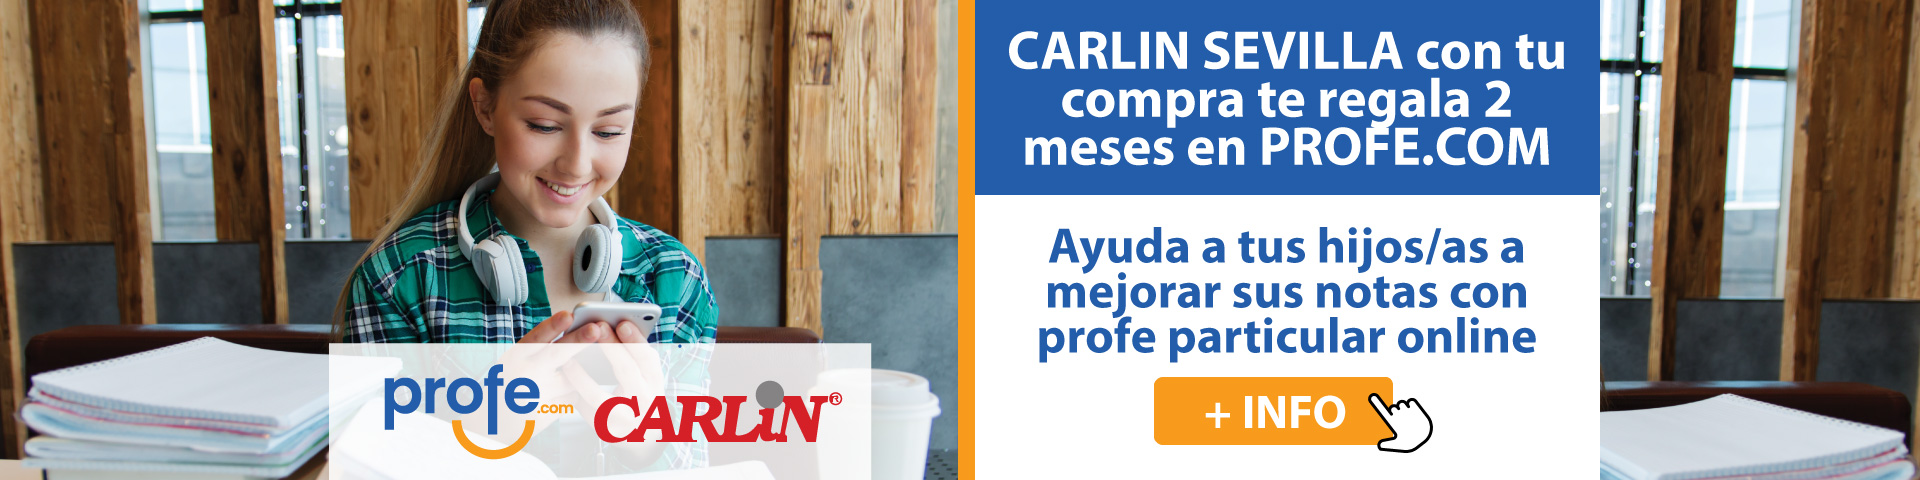 Promoción Carlin Sevilla & profe.com